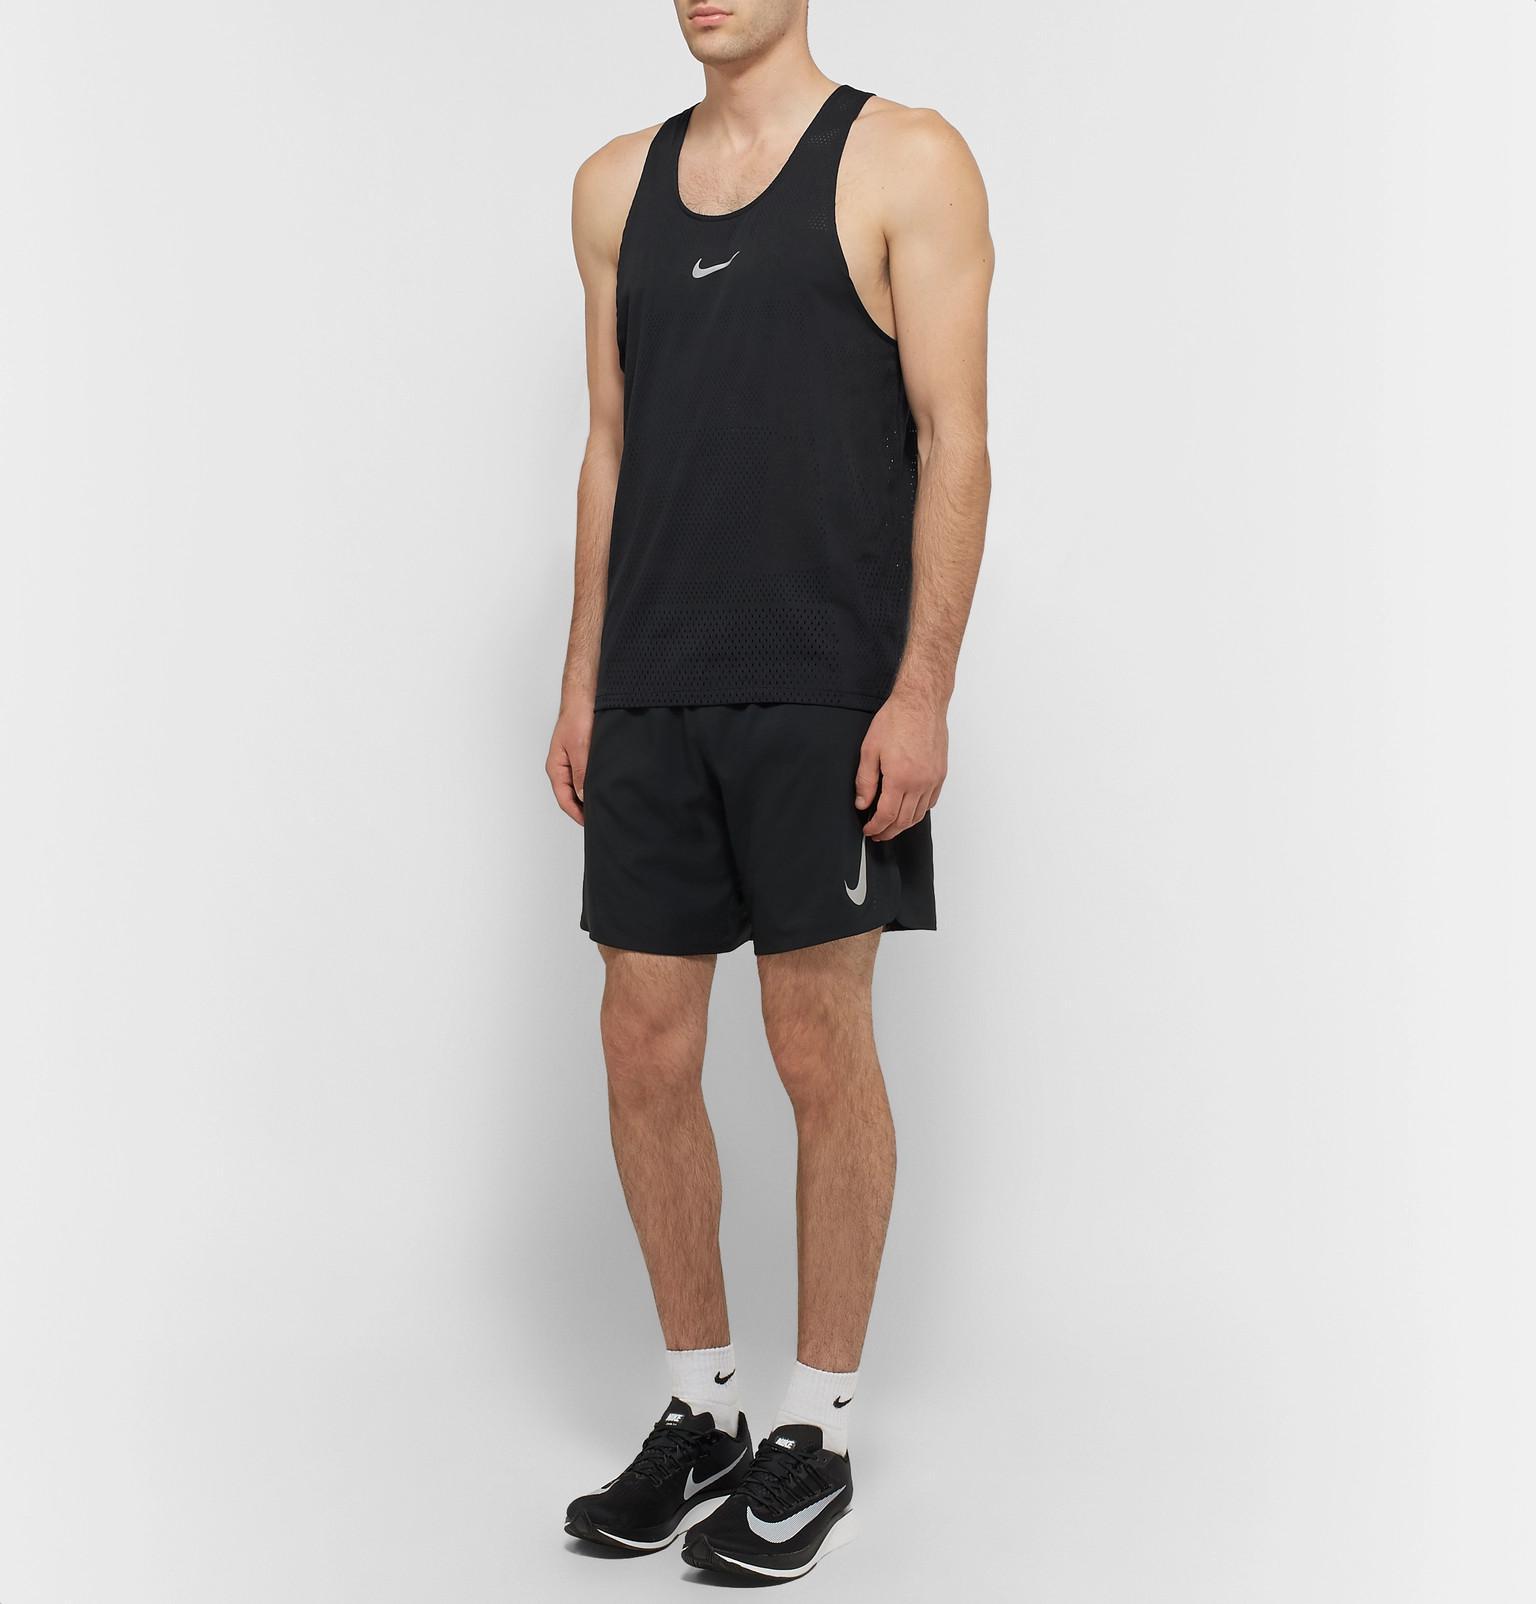 50f0aa70c768d5 Nike Aeroswift Mesh Tank Top in Black for Men - Lyst